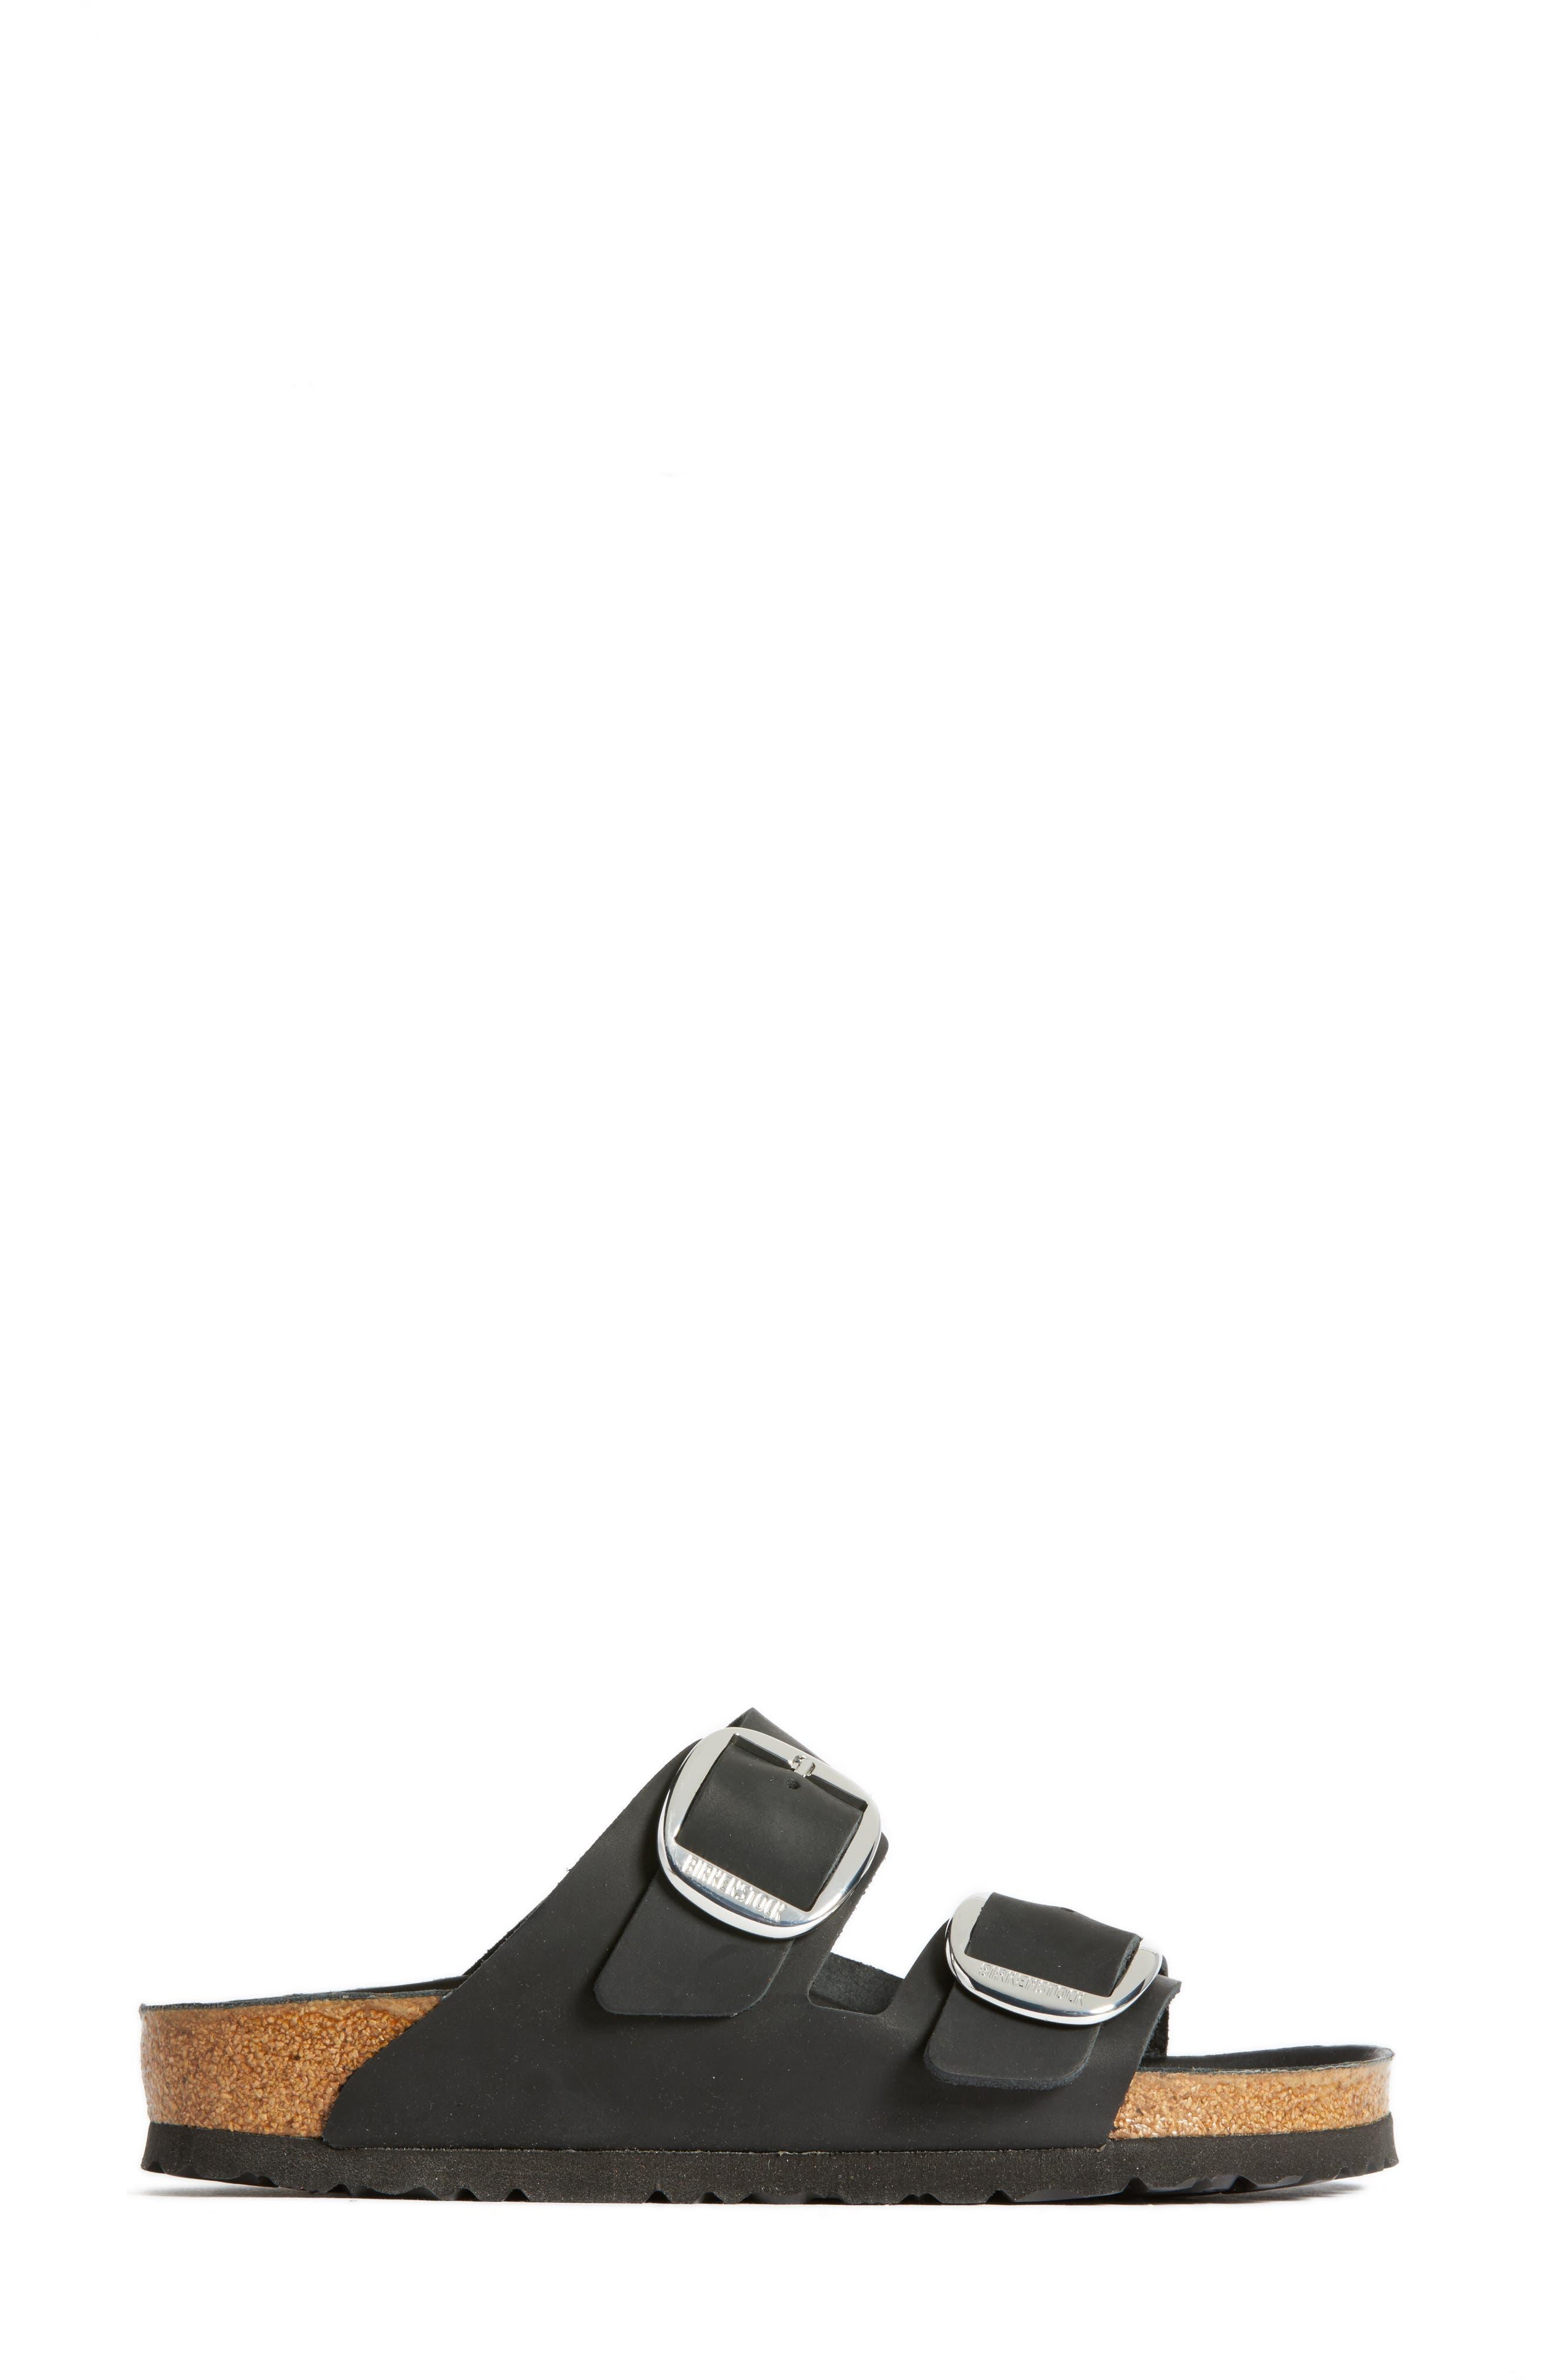 Arizona Big Buckle Slide Sandal,                             Alternate thumbnail 3, color,                             BLACK LEATHER